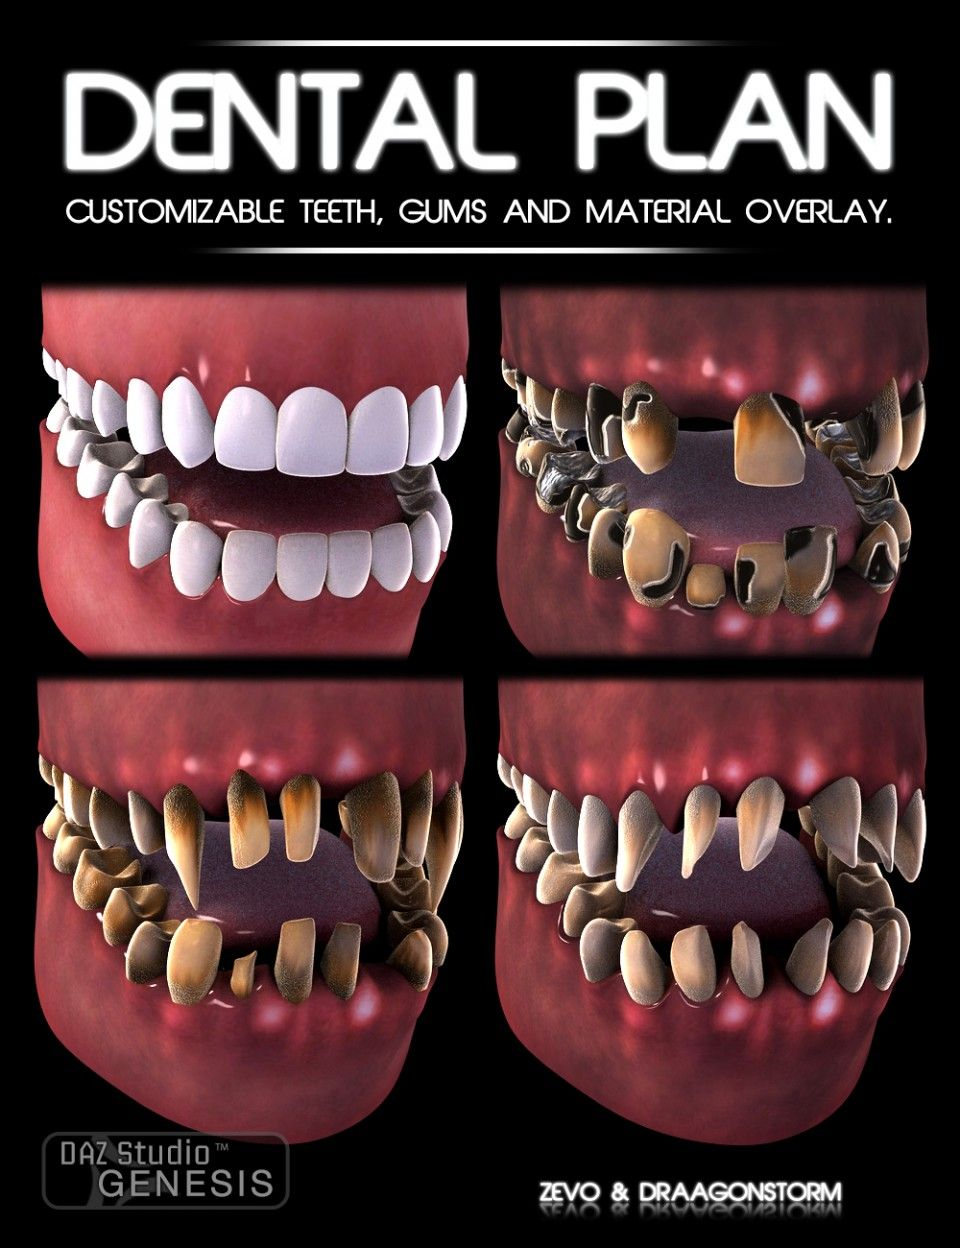 Dental Plan for Genesis Dental plans, Dental, How to plan